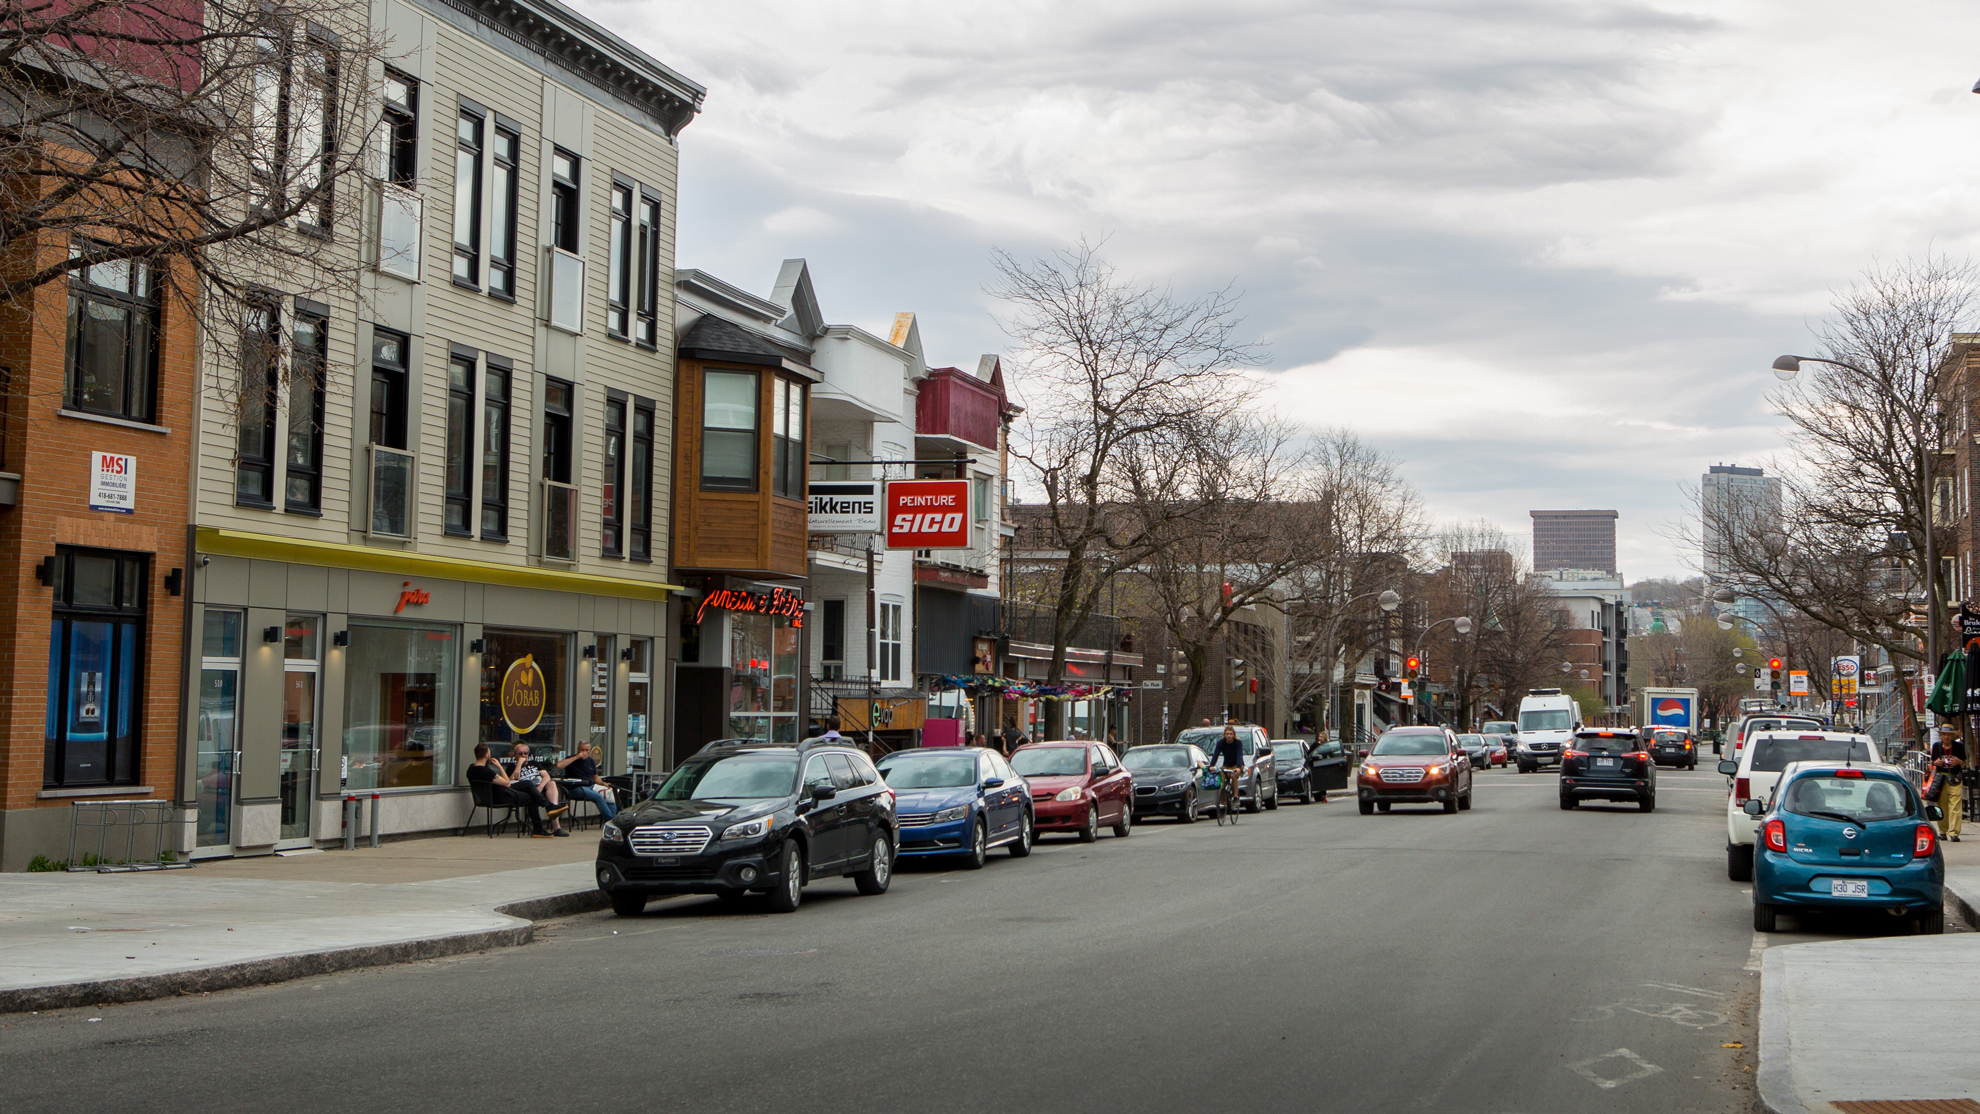 Borough image